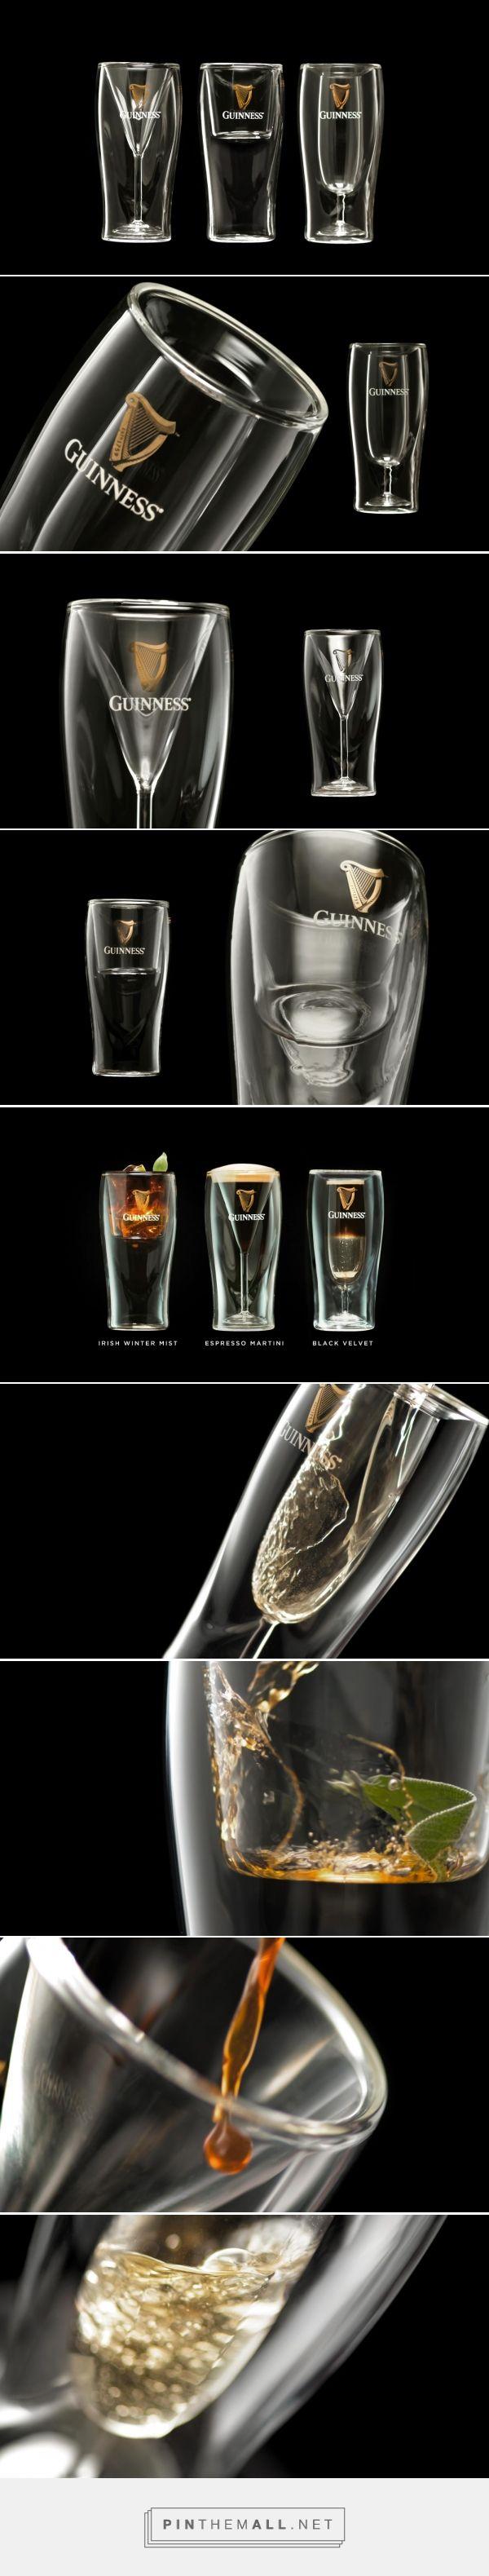 Guinness Signature Cocktail Glasses design by Ogilvydo (Ogilvy Malaysia) - http://www.packagingoftheworld.com/2016/12/guinness-signature-cocktail-glasses.html